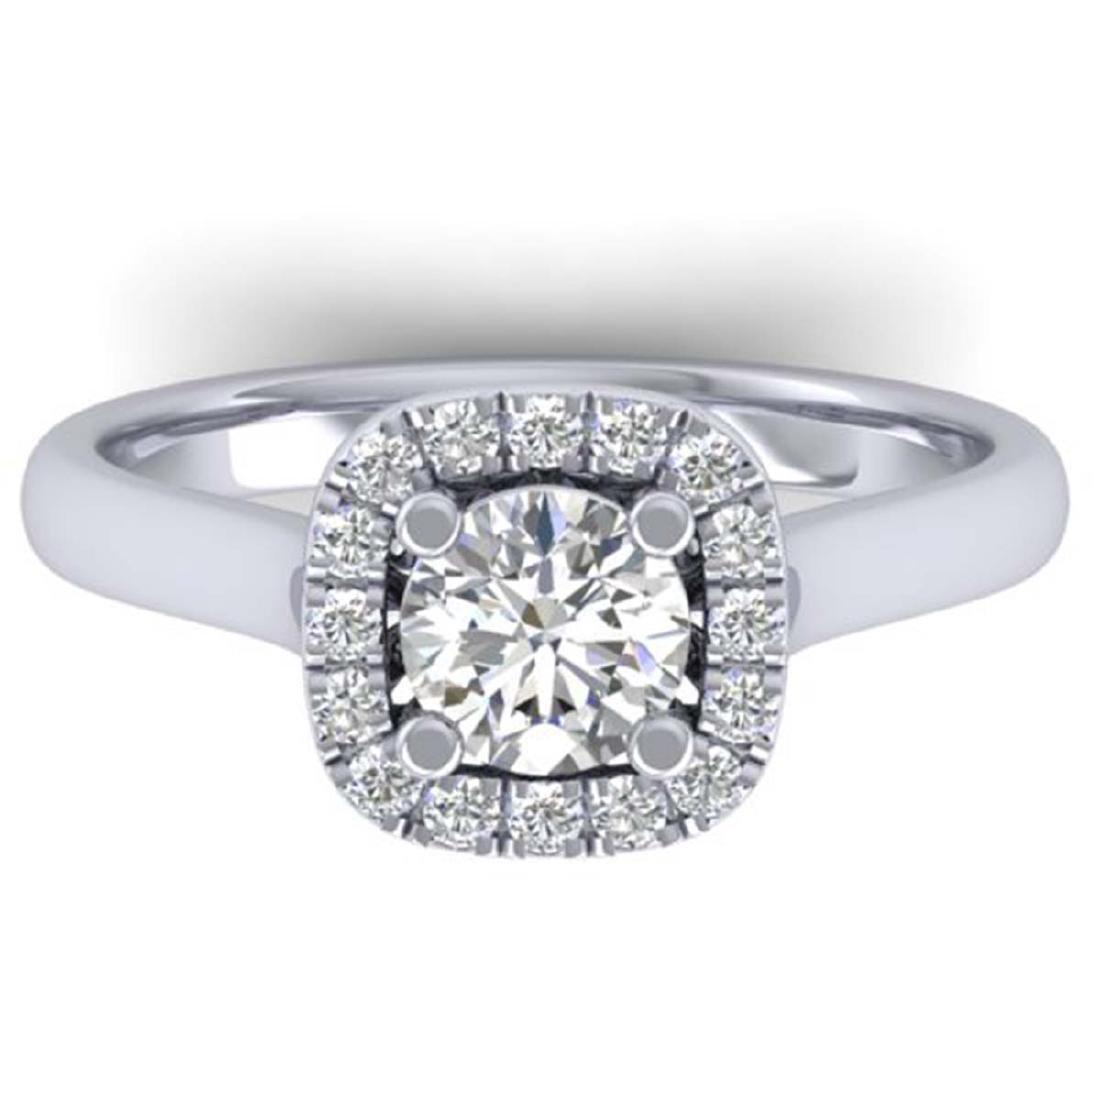 1.01 ctw VS/SI Diamond Solitaire Halo Ring 18K White